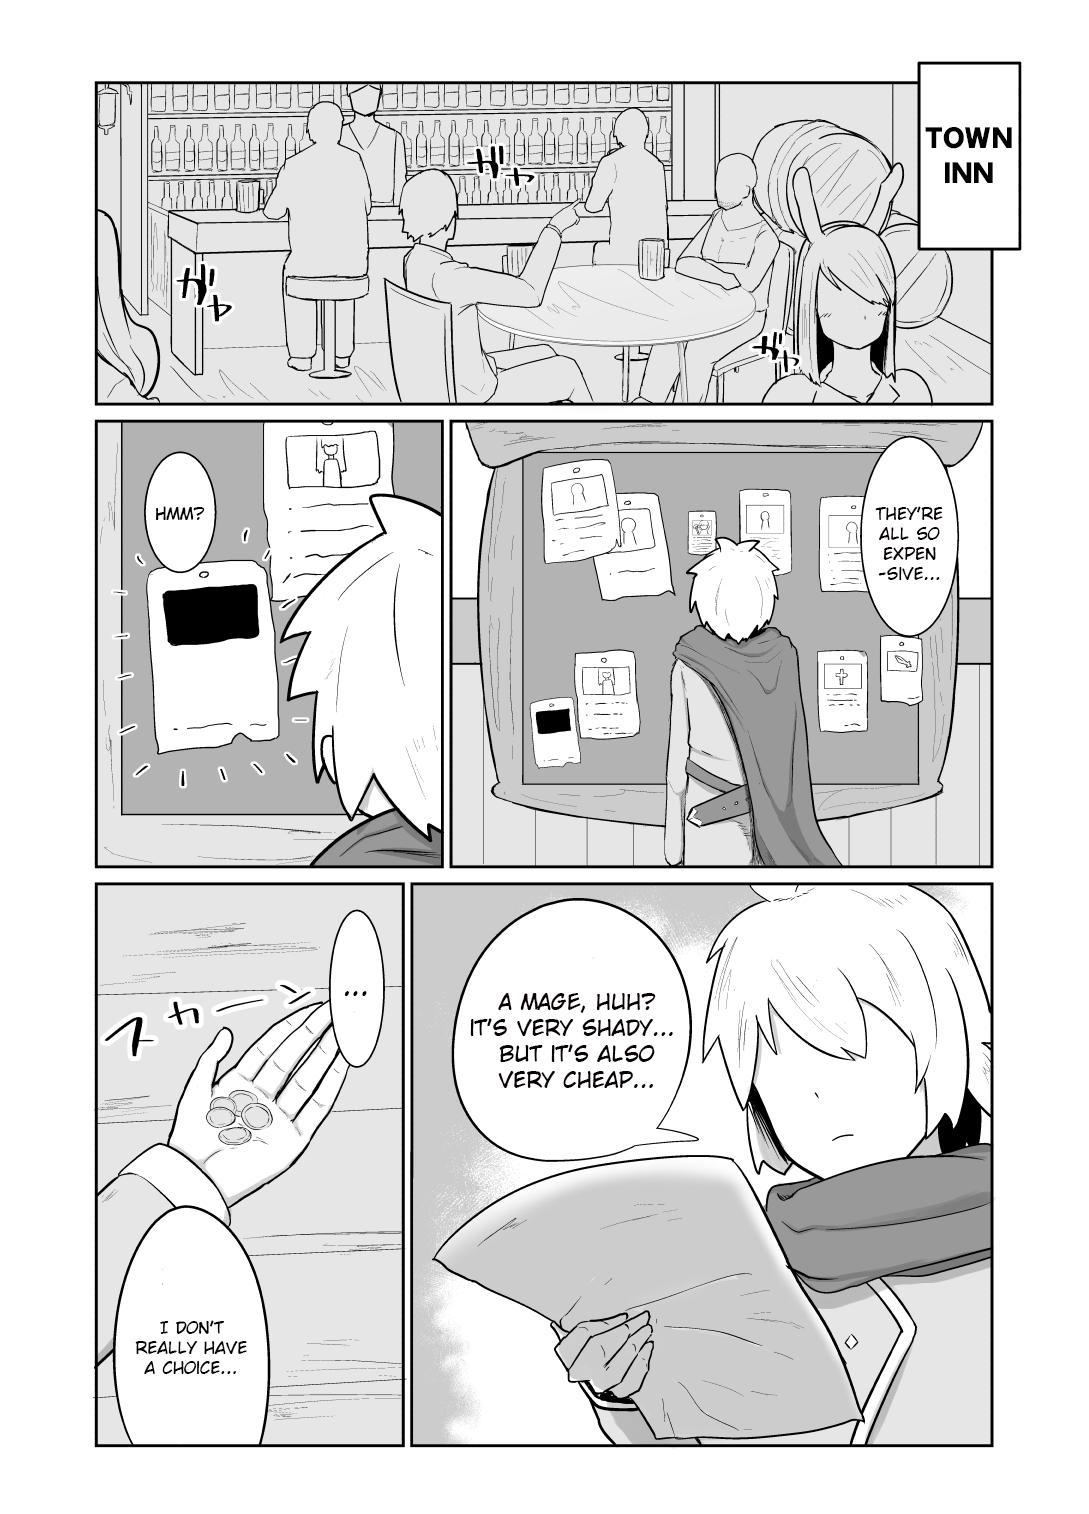 [Initiative (Fujoujoshi)] Party ni Yatotta Mahoutsukai ni Musekinin Tanetsuke Suru Hanashi | Hiring a mage to breed her irresponsibly [English] (RhinocerosBeetle] 6